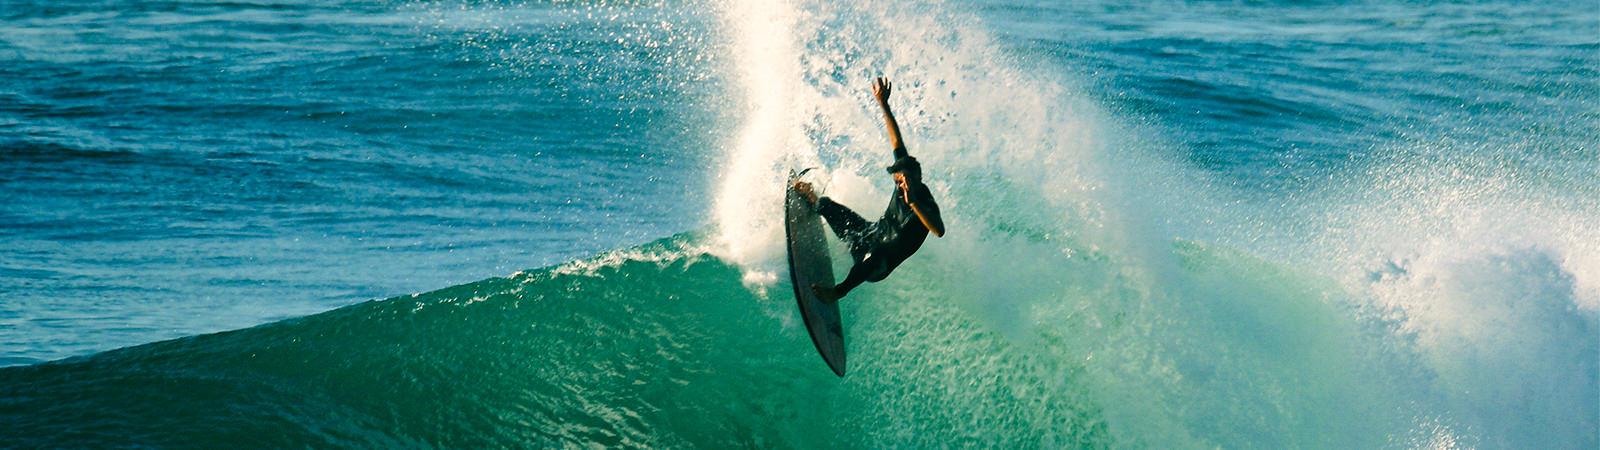 GMC Surfboard